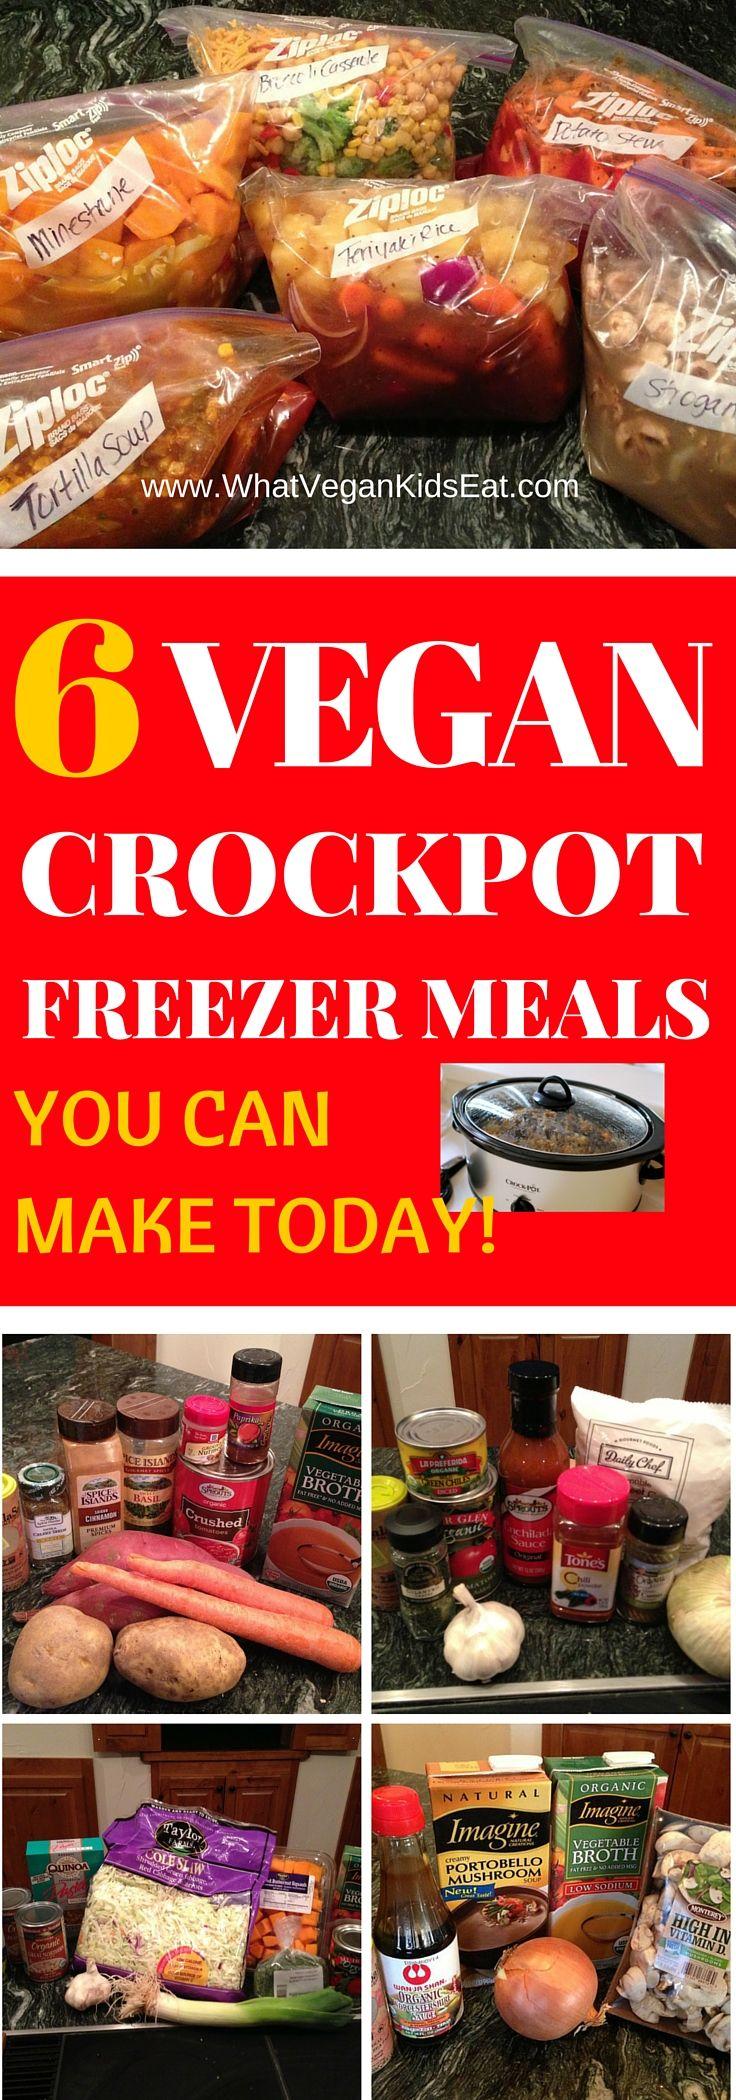 18 vegetarian recipes freezer ideas